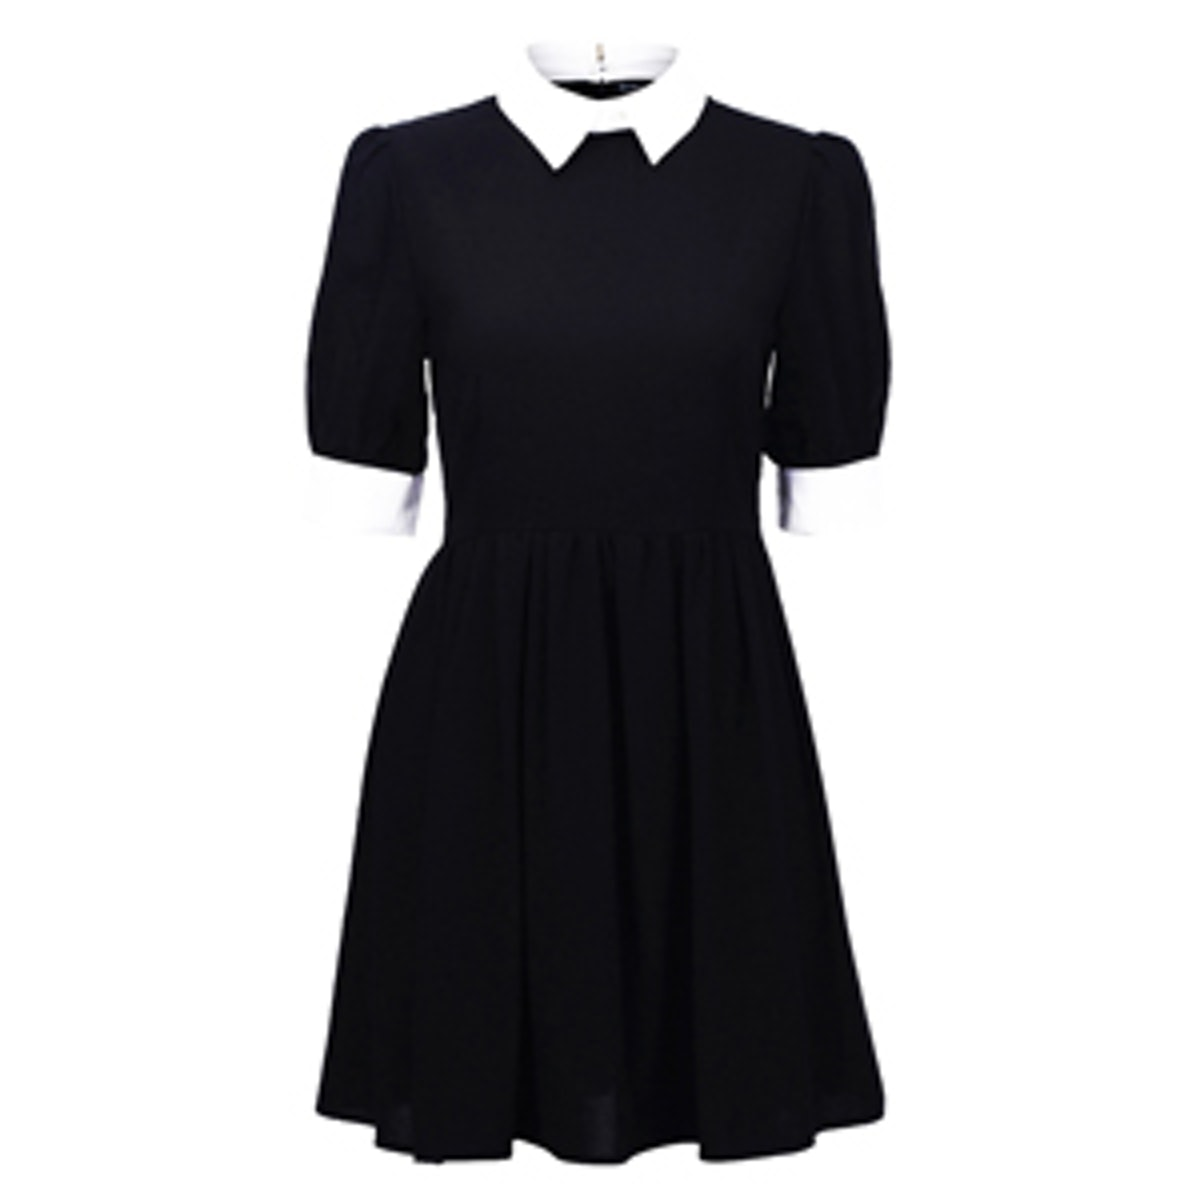 Retro Lapel Dress